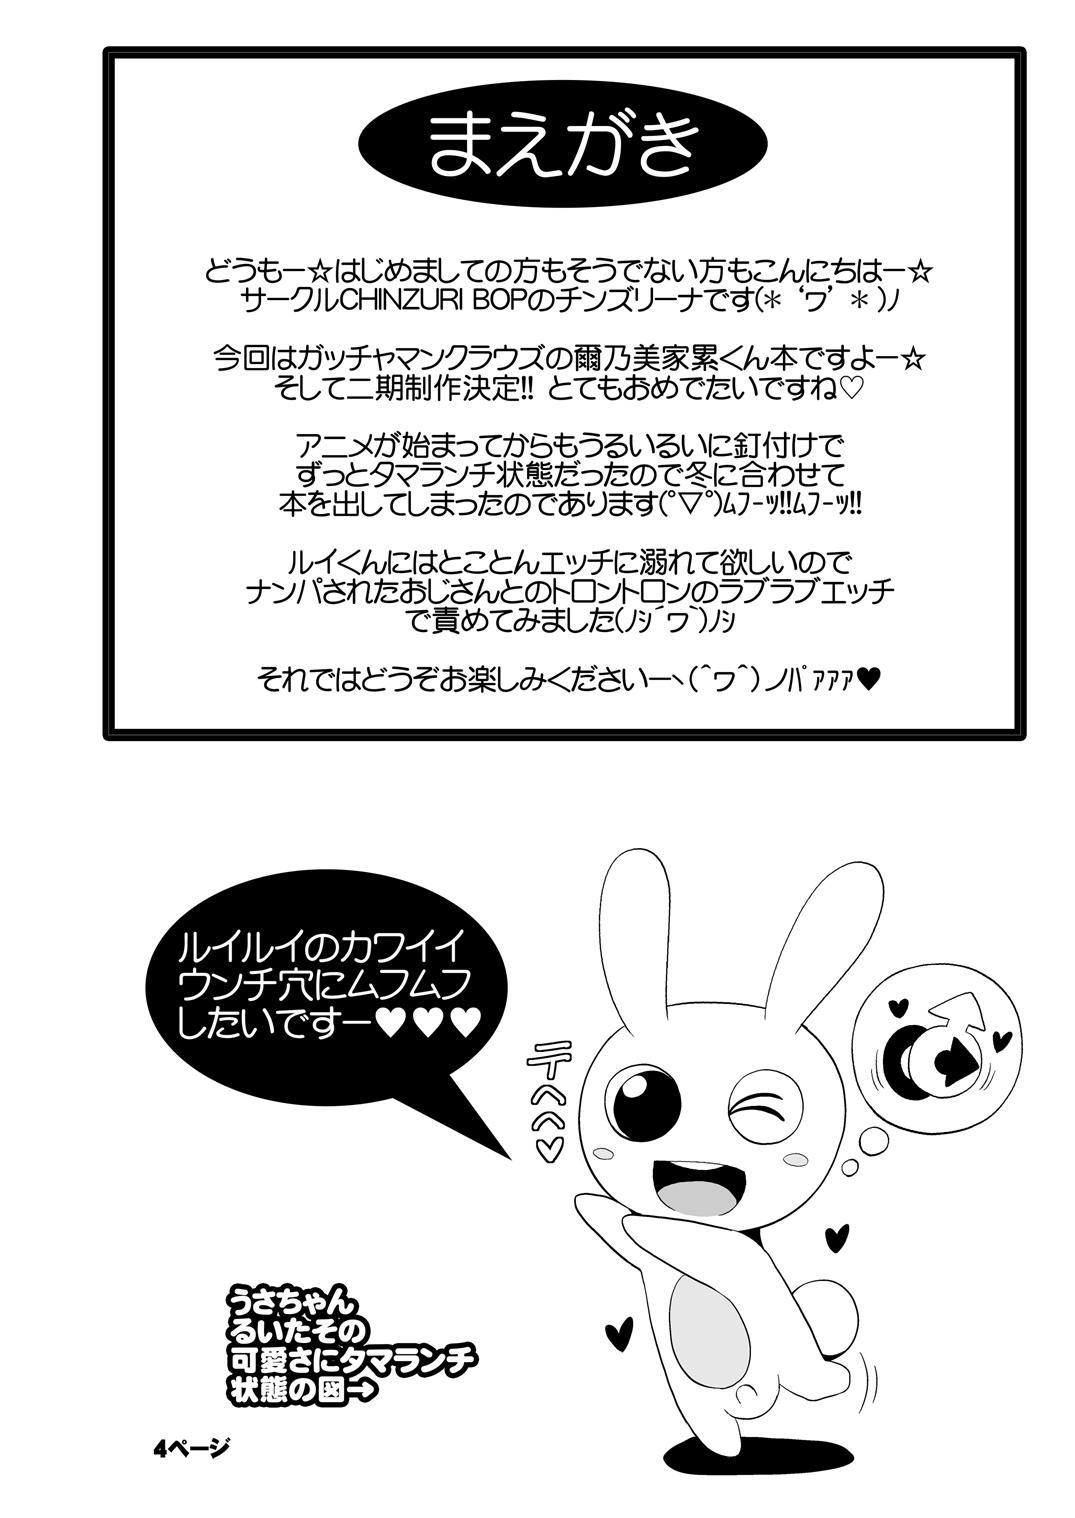 [CHINZURI BOP (Chinzuriina)] Comic Furechin 2013-12 - Rui Feminization Squad (Gatchaman Crowds) [English] =SW= [Digital] 3